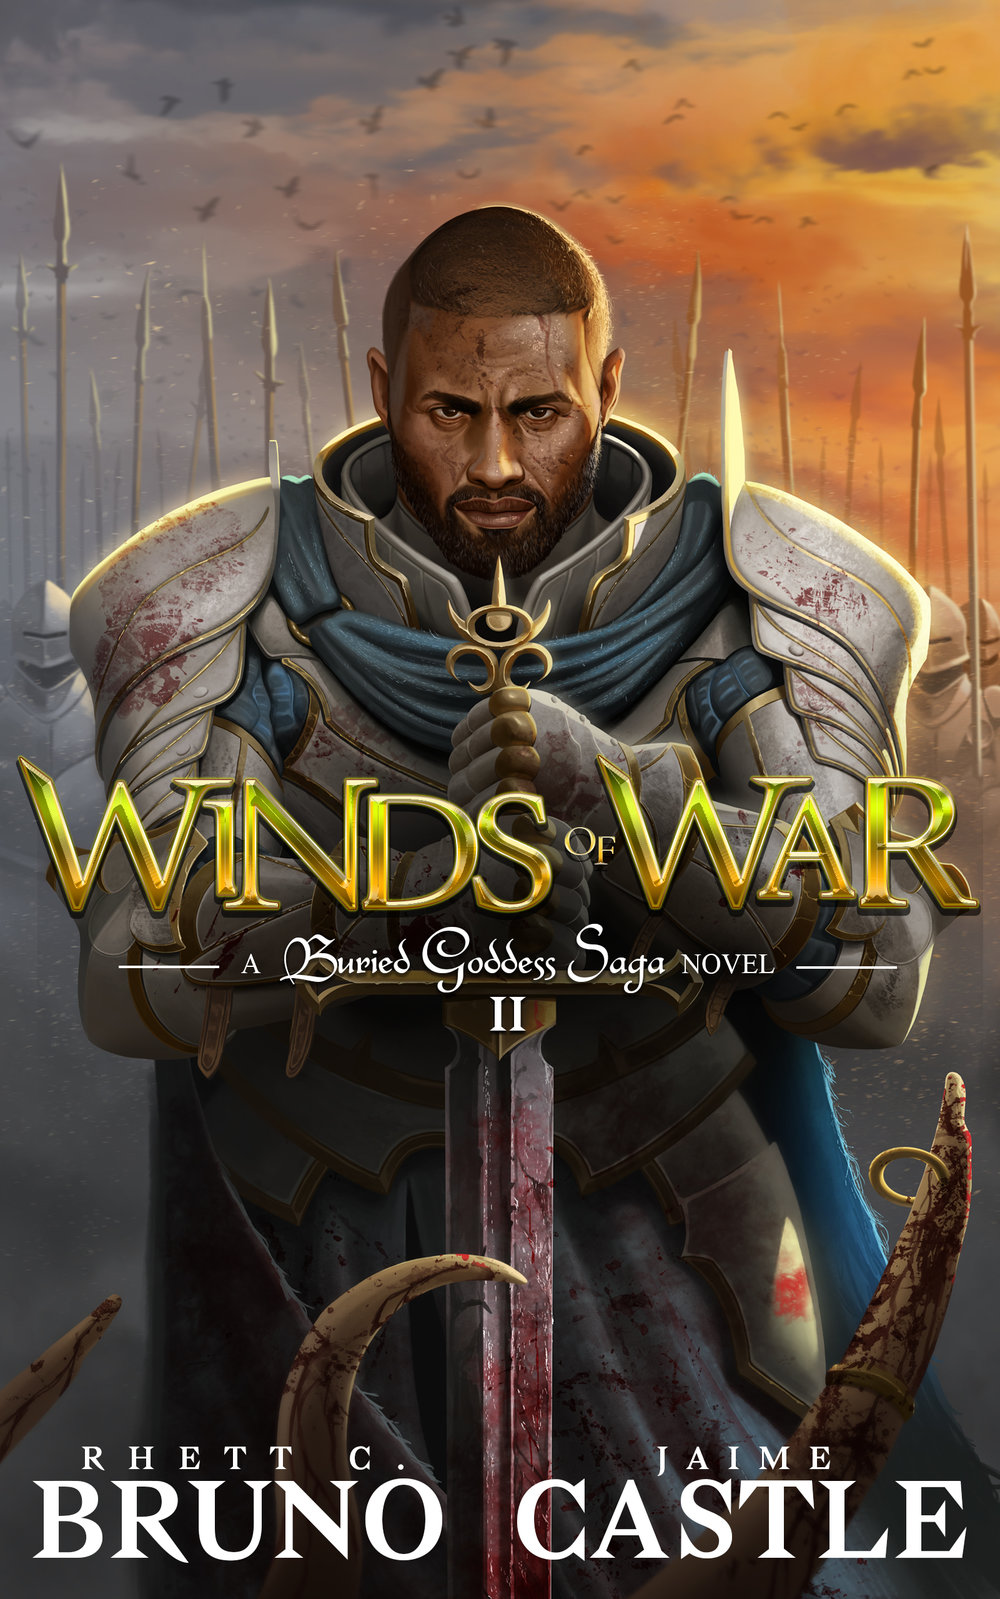 Winds of War   Buried Goddess Saga Book 2  Rhett C. Bruno & Jaime Castle